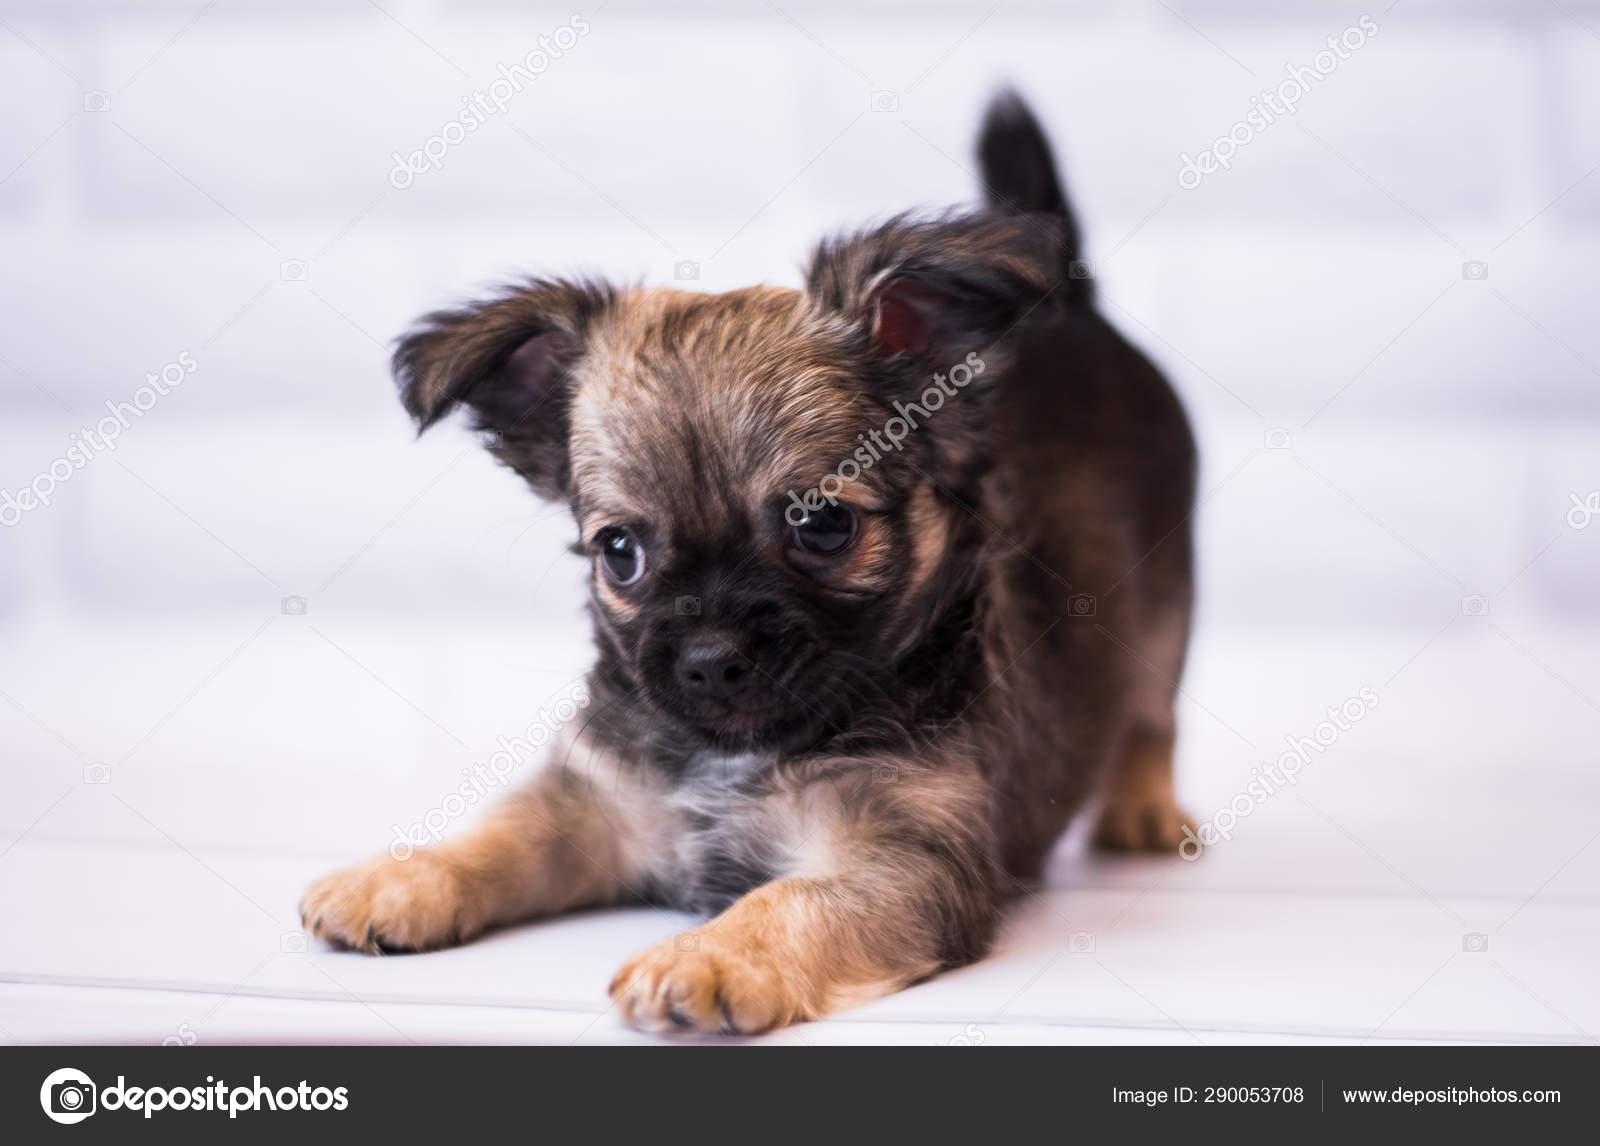 Chihuahua Puppy Spitz Dog Pet Yorkshire Terrier Stock Photo C Dasholivia 290053708